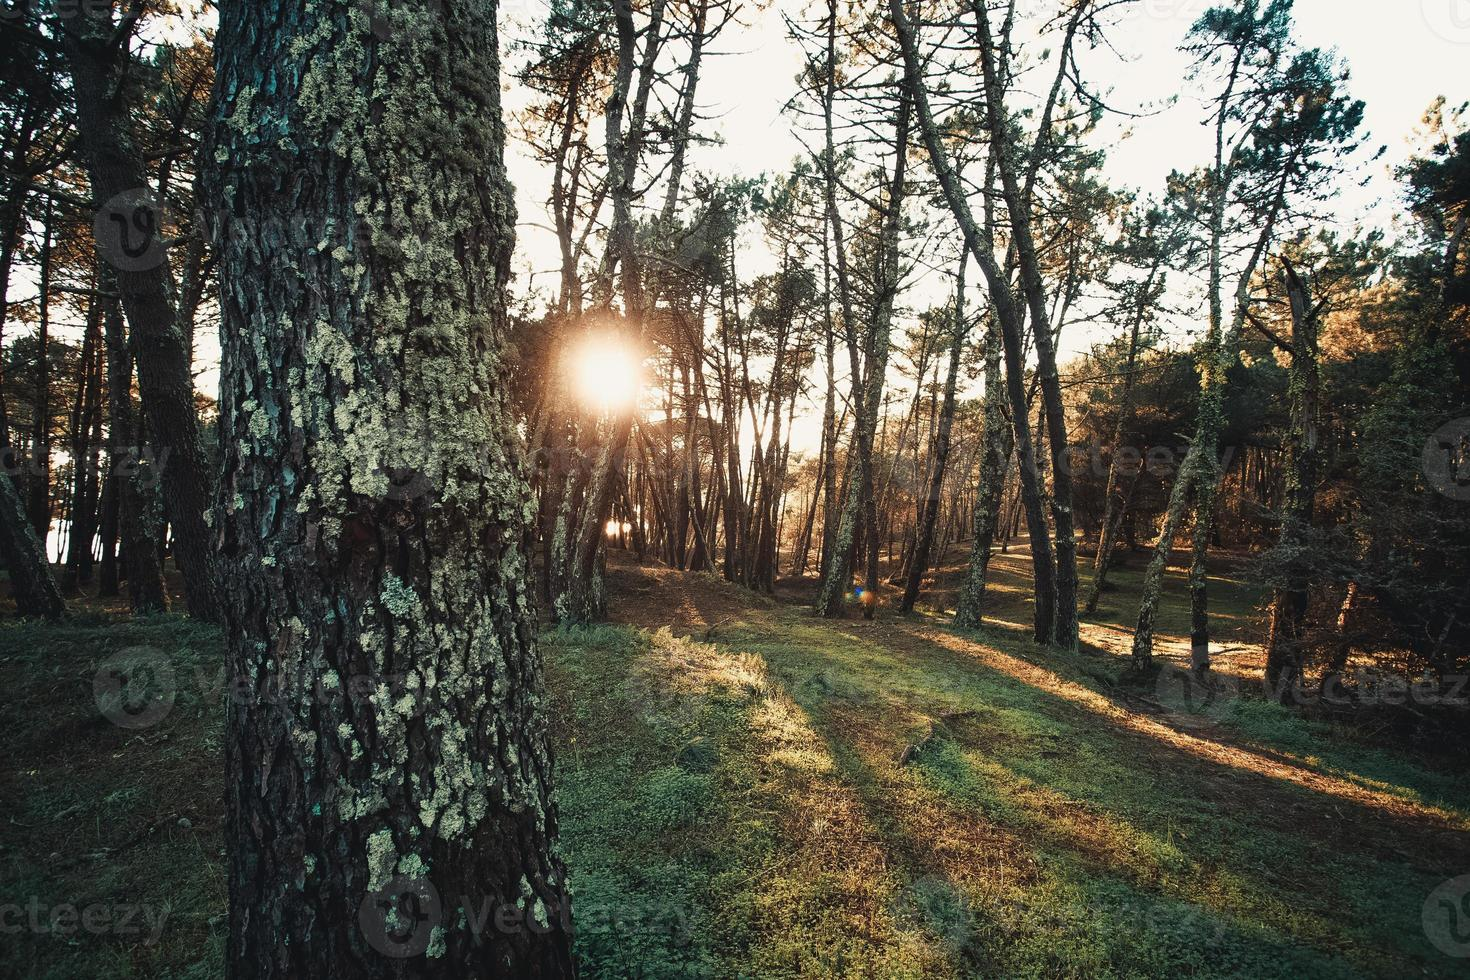 skog under en solnedgång foto